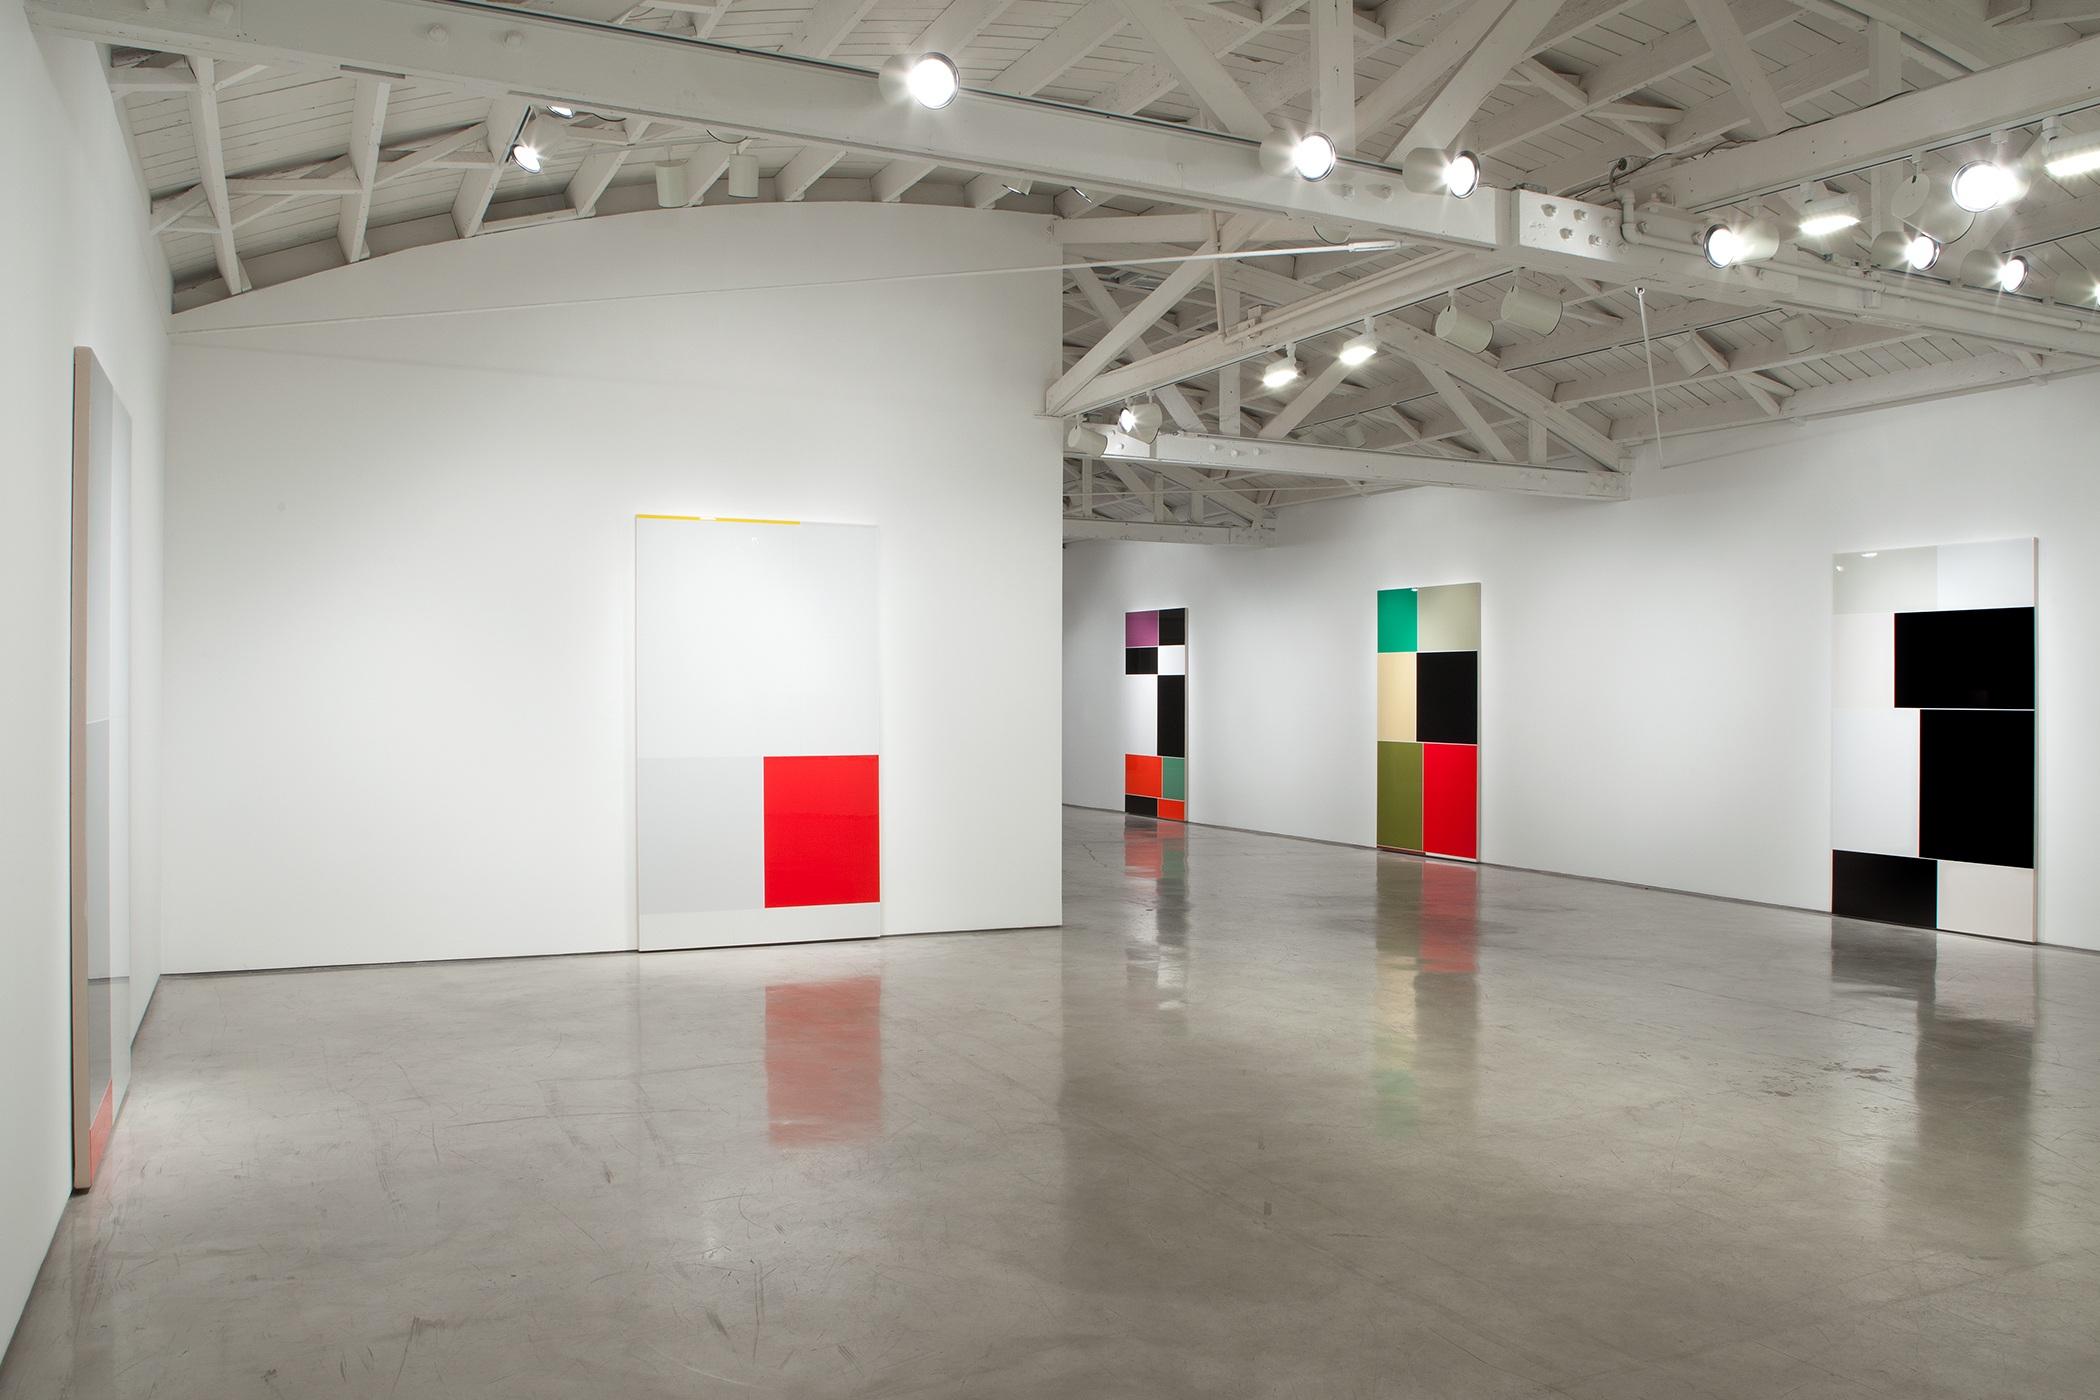 Intervals - Solo Exhibition at Moran Bondaroff